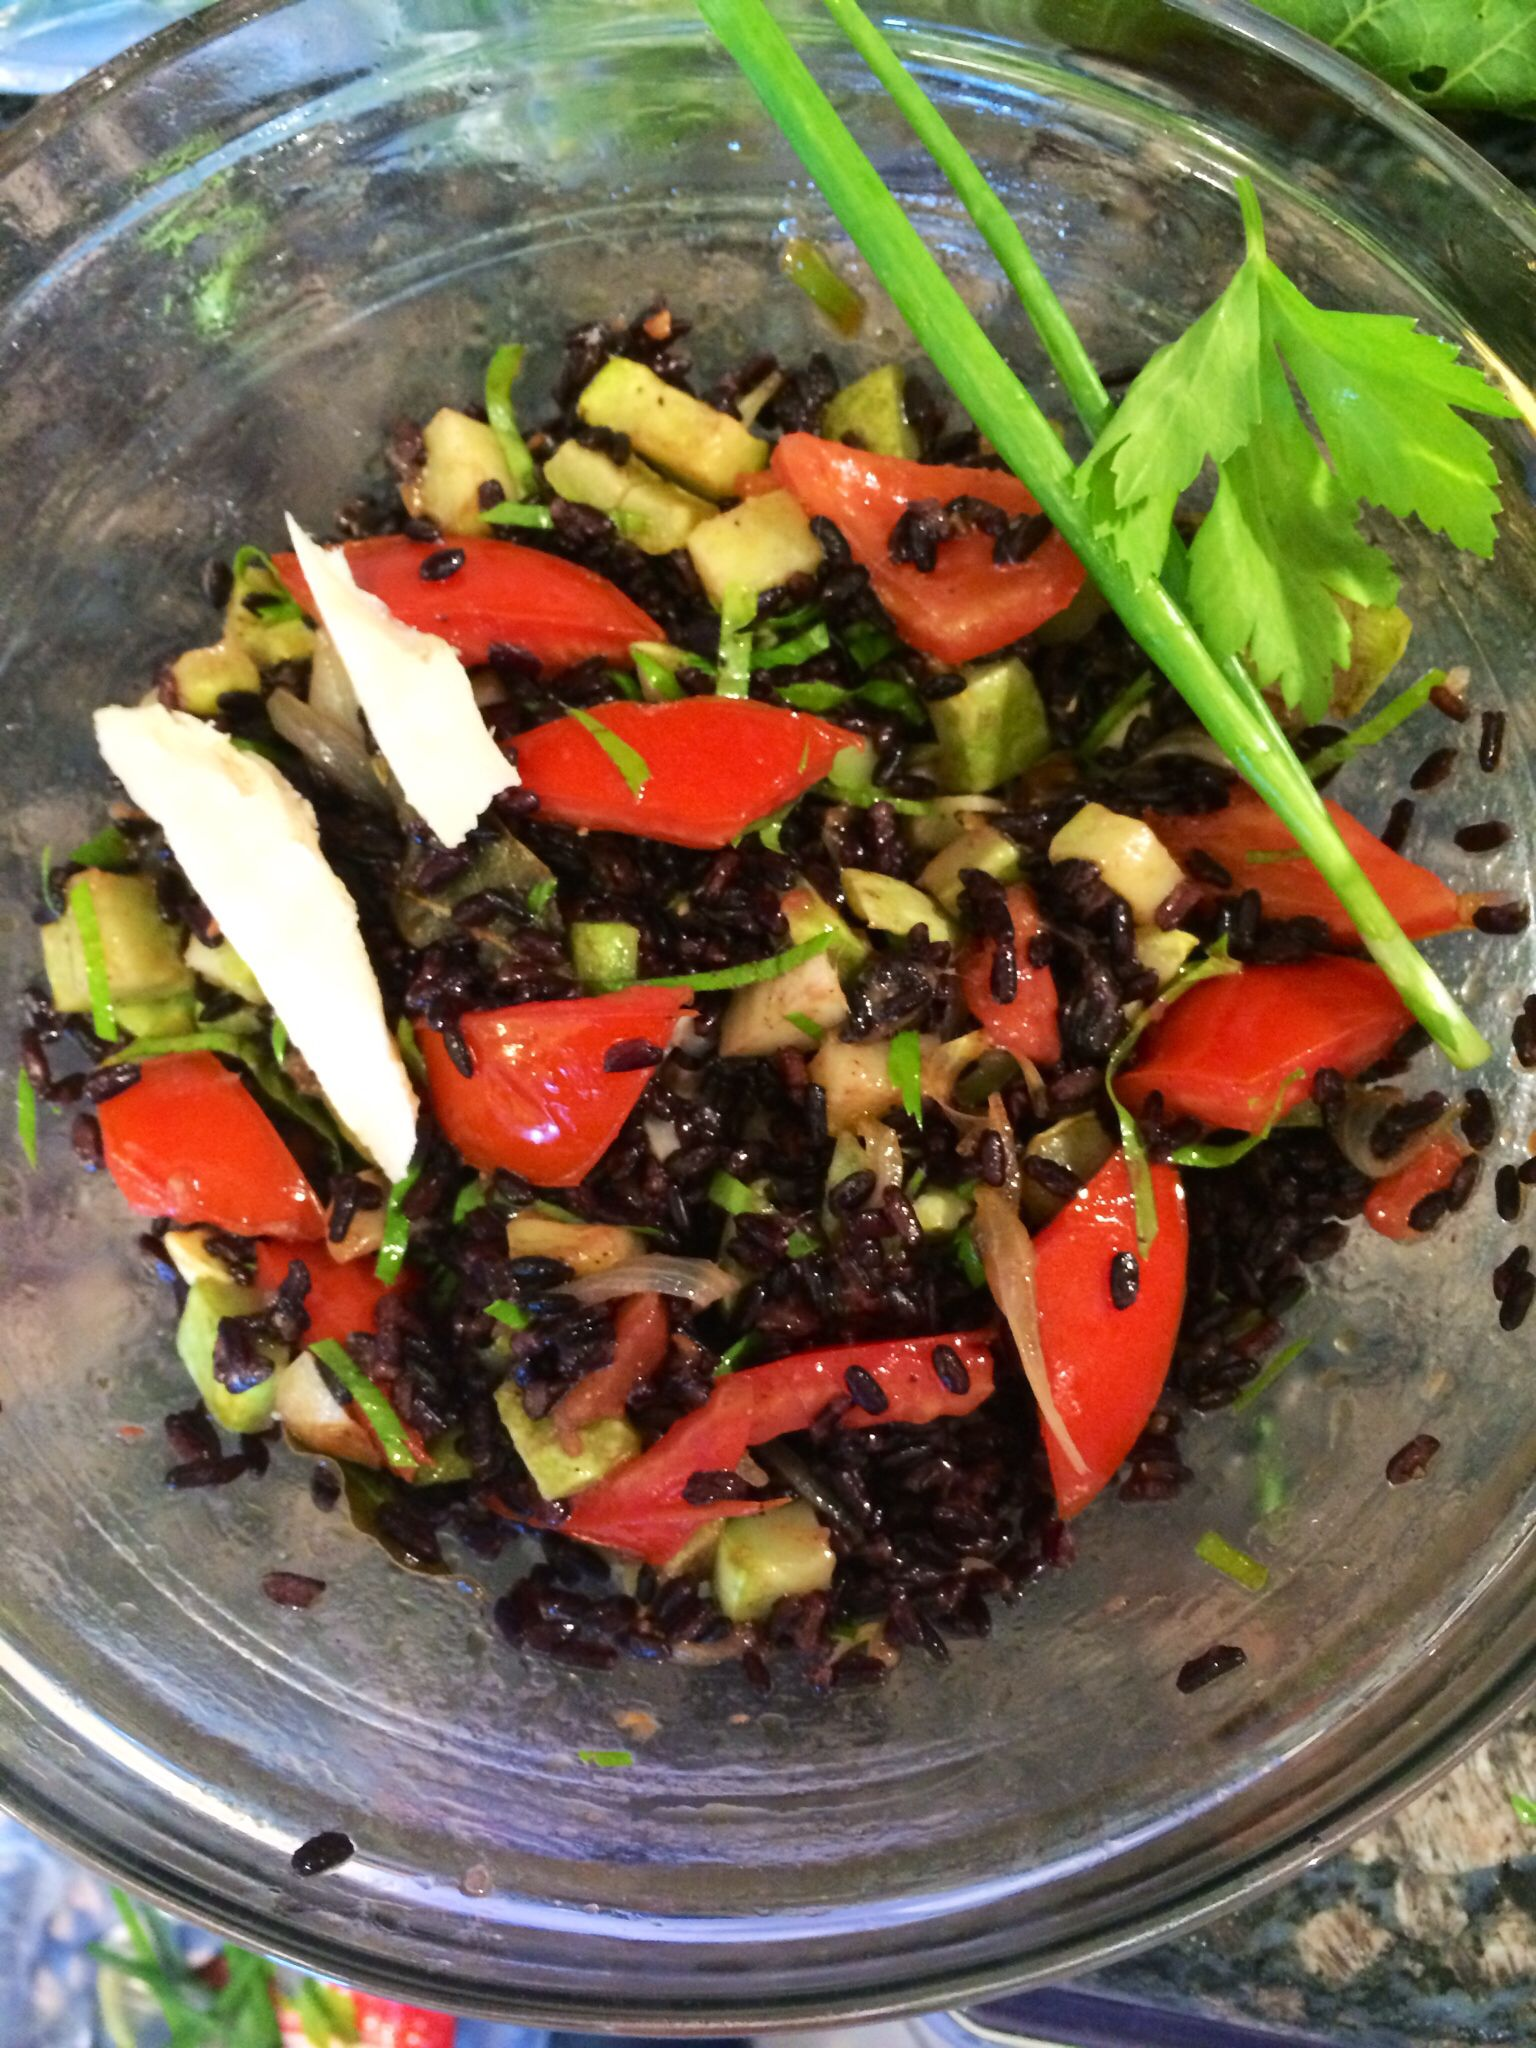 My lovely Black rice salad